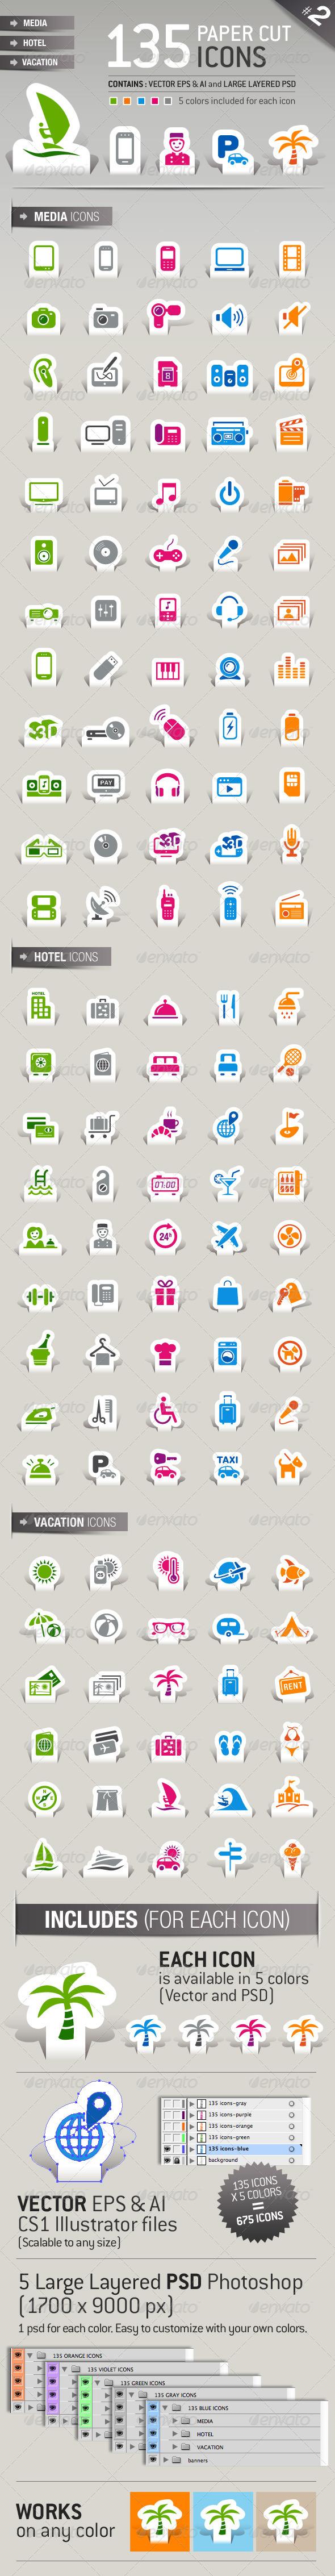 GraphicRiver 135 Papercut Icons 2516781